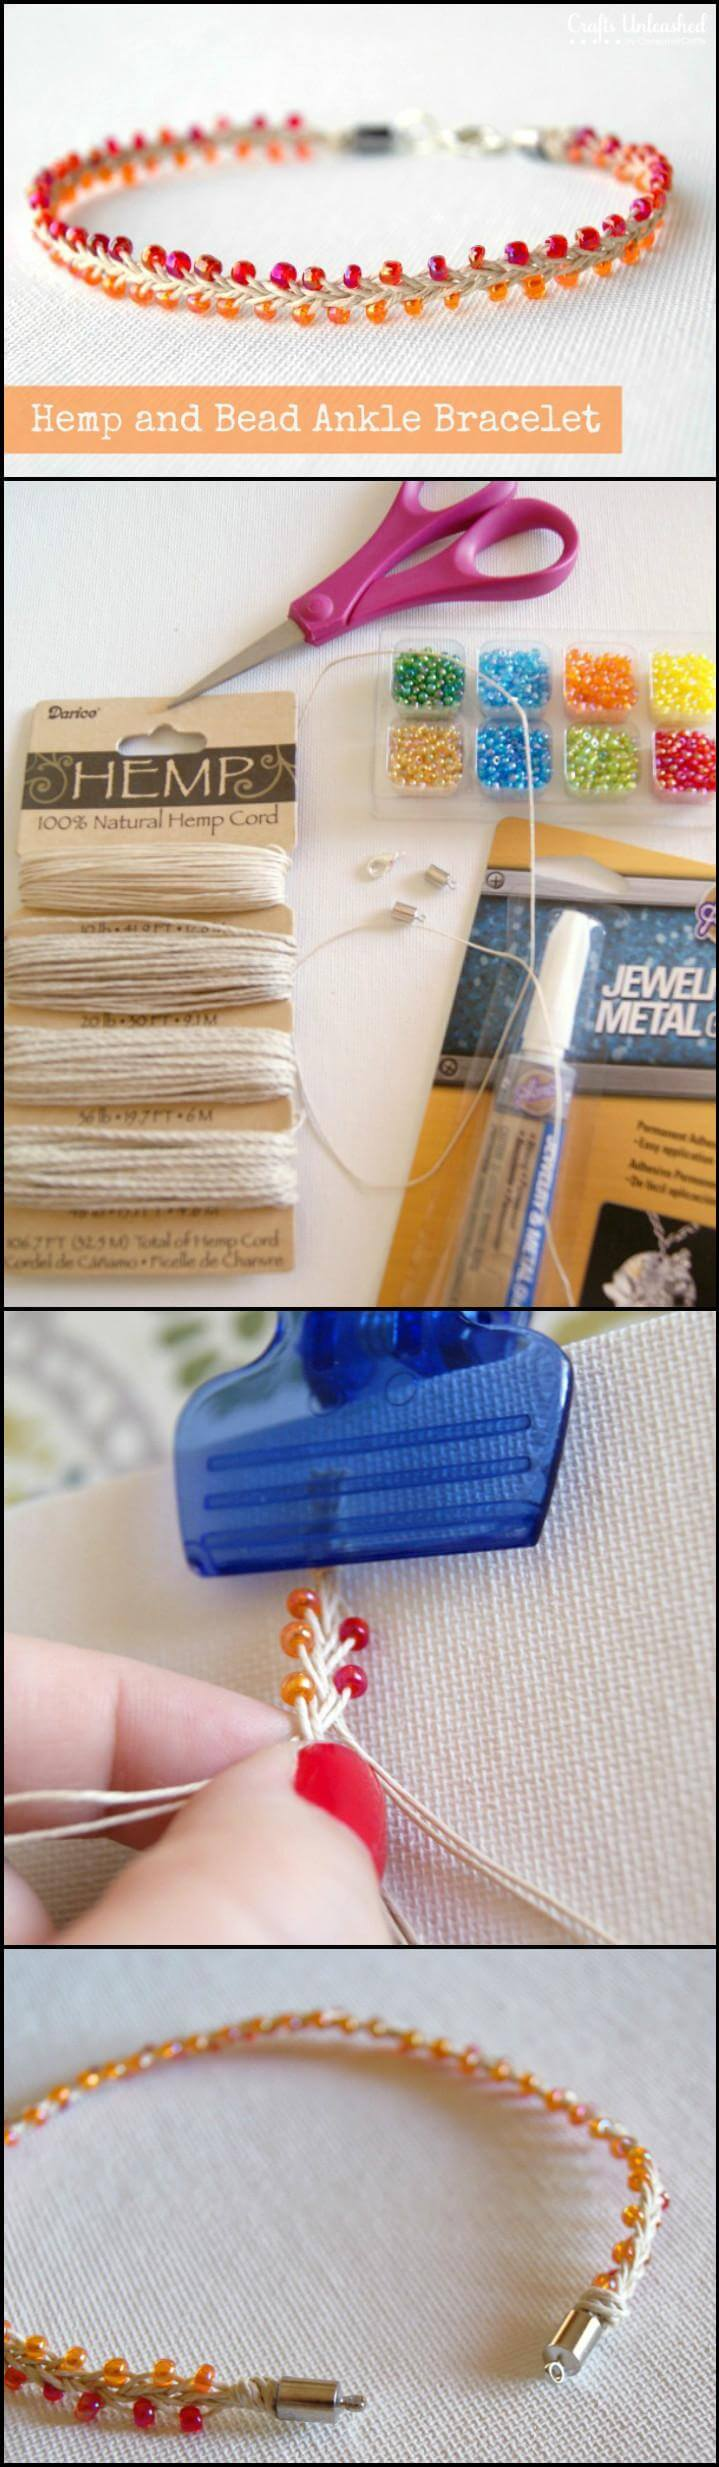 easy hemp and bead ankle bracelet